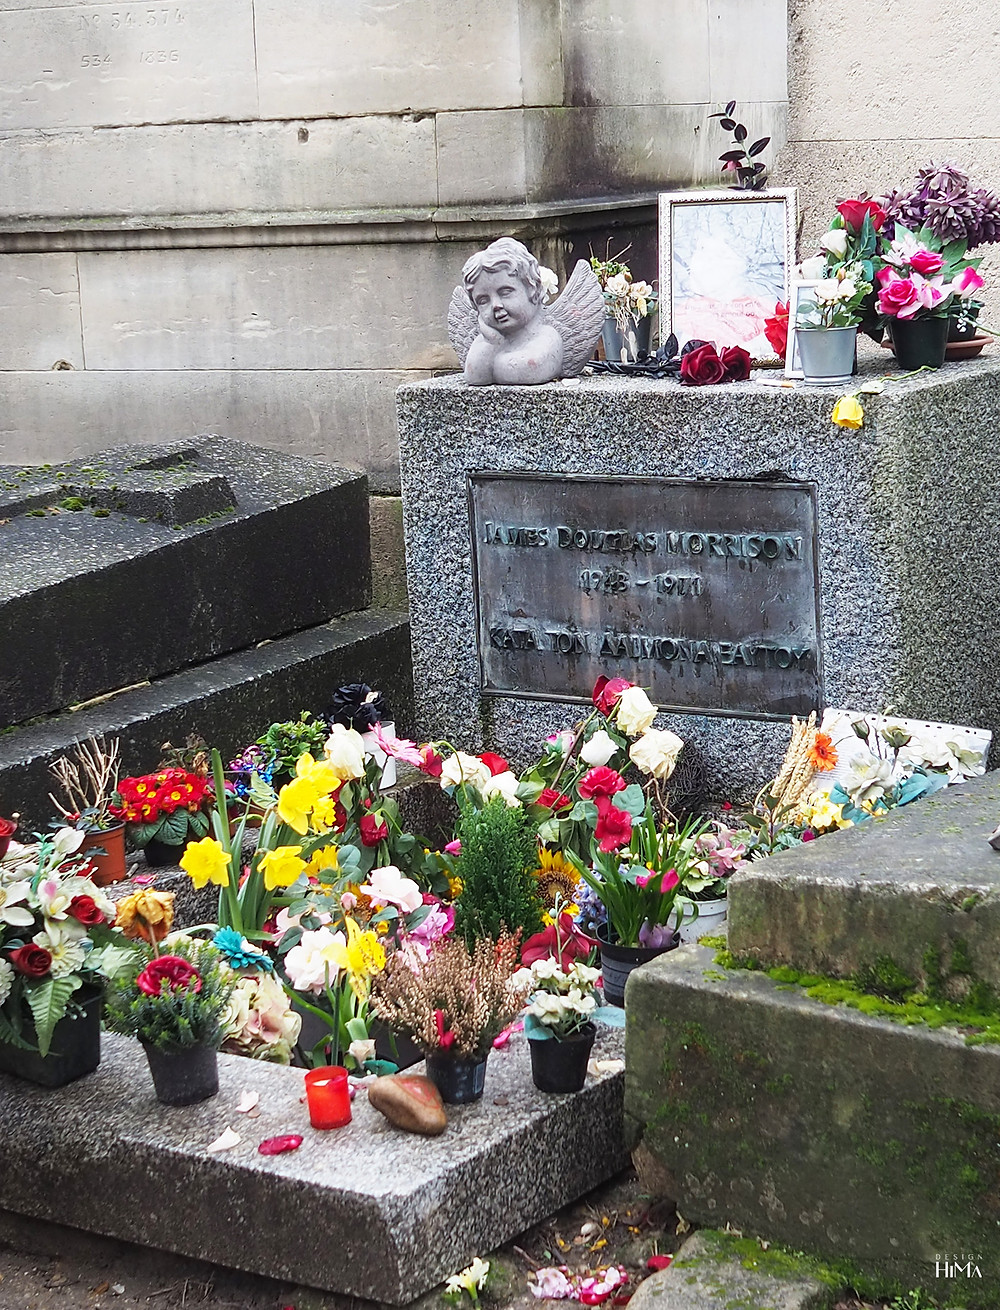 Jim Morrisonin hauta, Pariisi